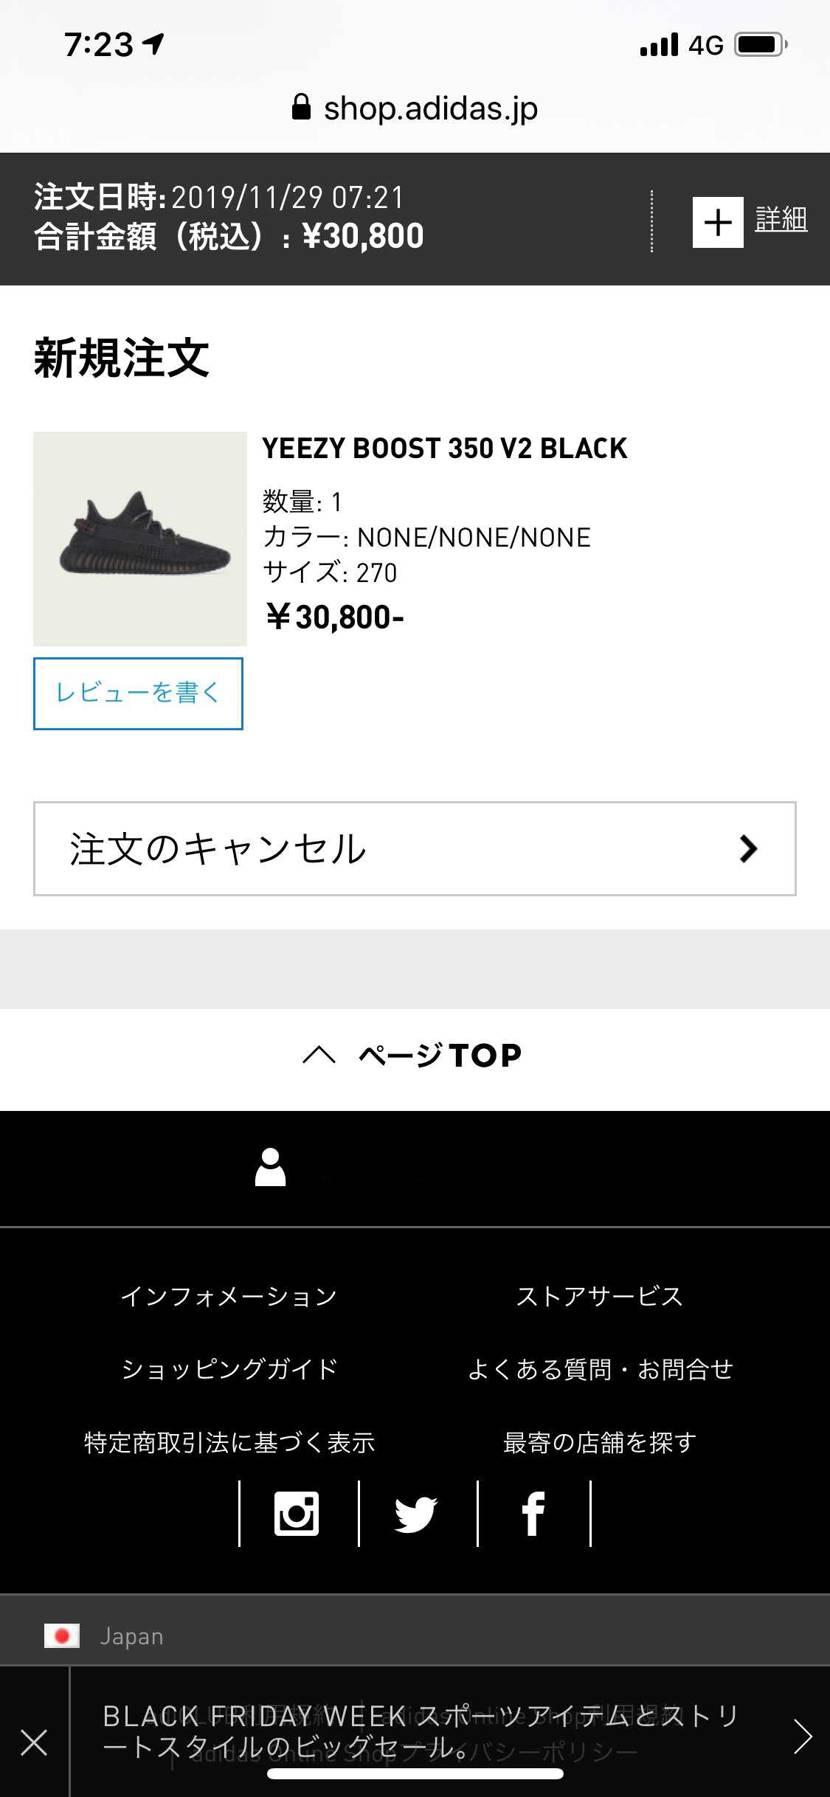 YEEZY BOOST 350 V2 adidasオンラインで簡単に購入出来る様